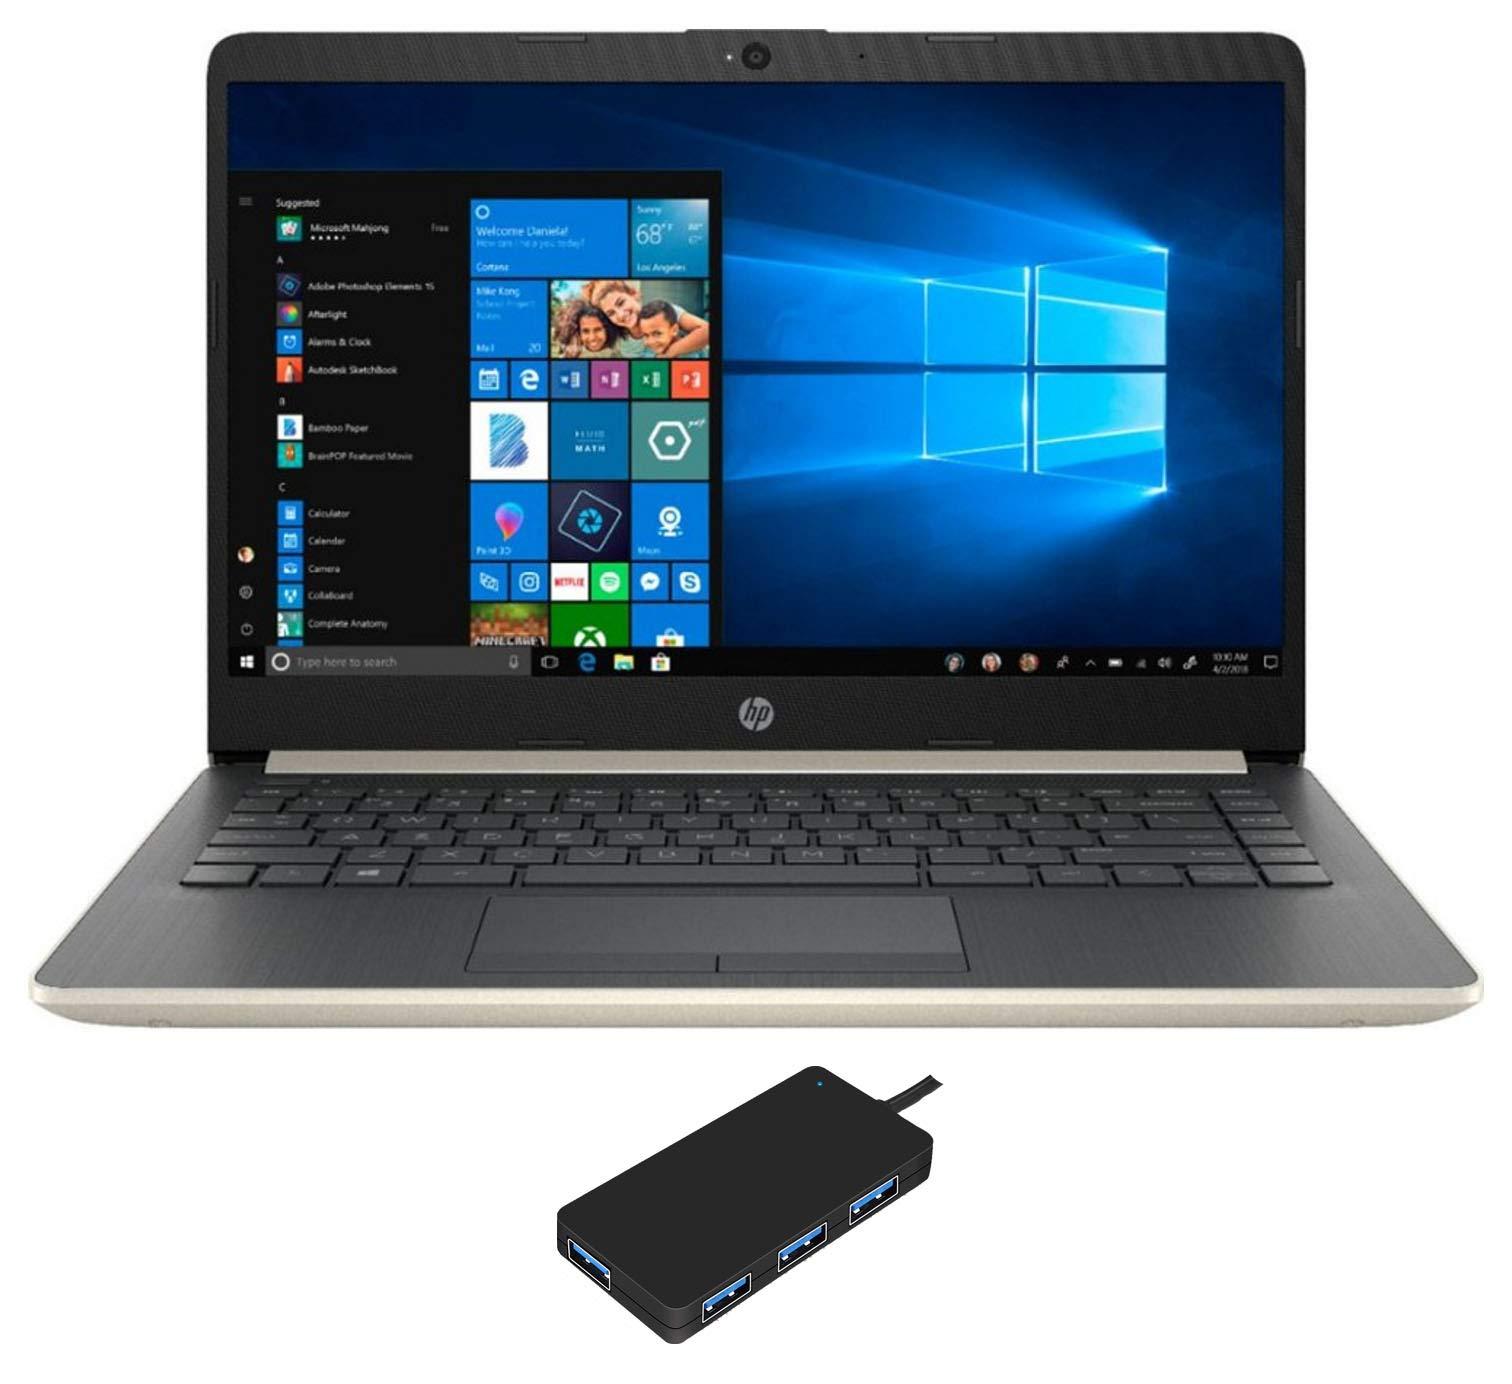 "HP 14-CF0006DX Home Office Laptop (Intel i3-7100U 2-Core, 4GB RAM, 128GB m.2 SATA SSD, 14"" HD (1366x768), Intel HD 620, WiFi, Bluetooth, Webcam, 2xUSB 3.1, 1xHDMI, SD Card, Win 10 Pro (S-Mode))"